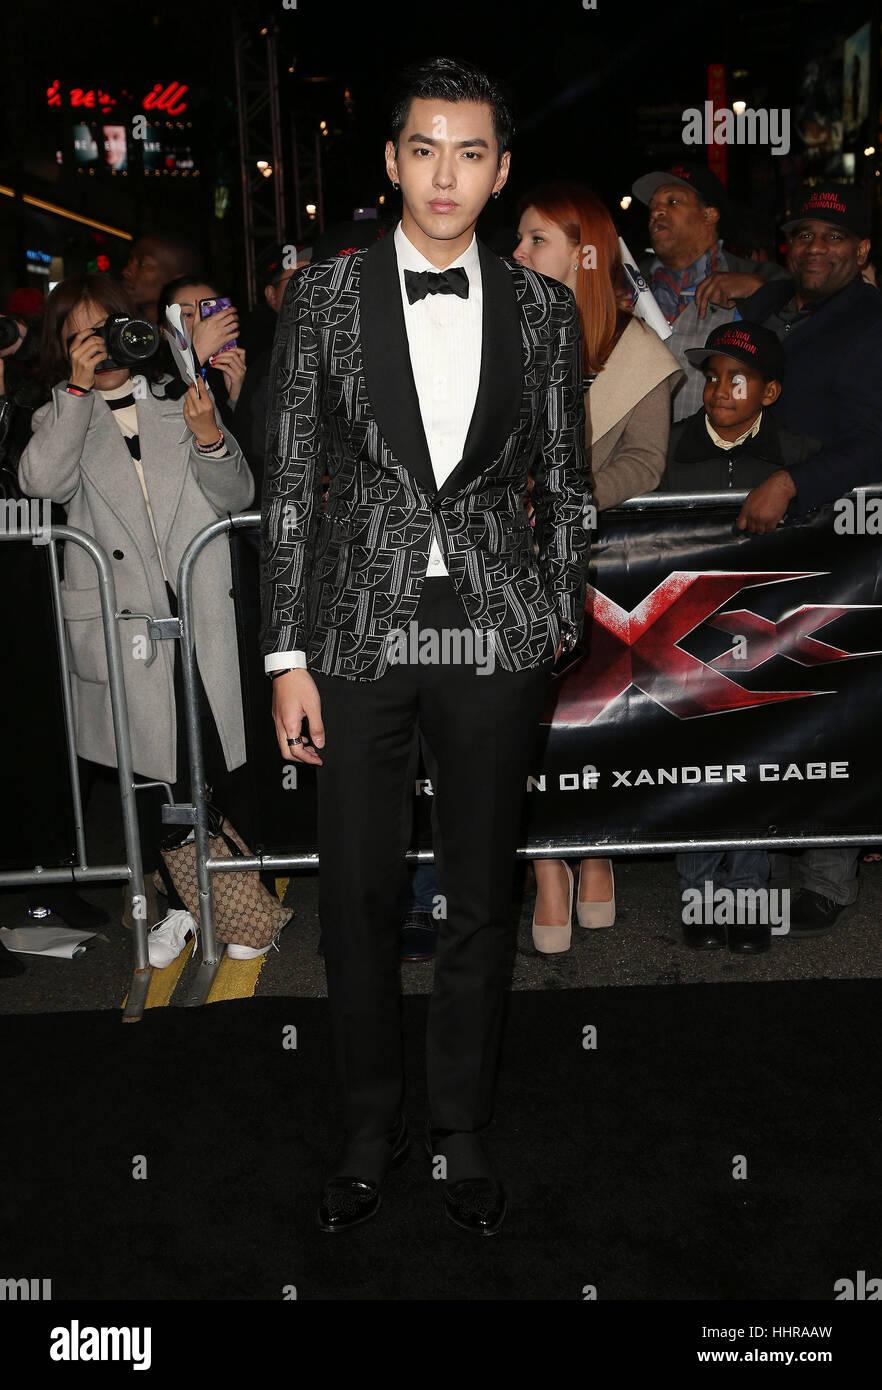 "Hollywood, USA. 19. Januar 2017. Kris Wu gesehen, Teilnahme an der ""xXx: Return Of Xander Cage' Los Angeles Premiere Stockfoto"